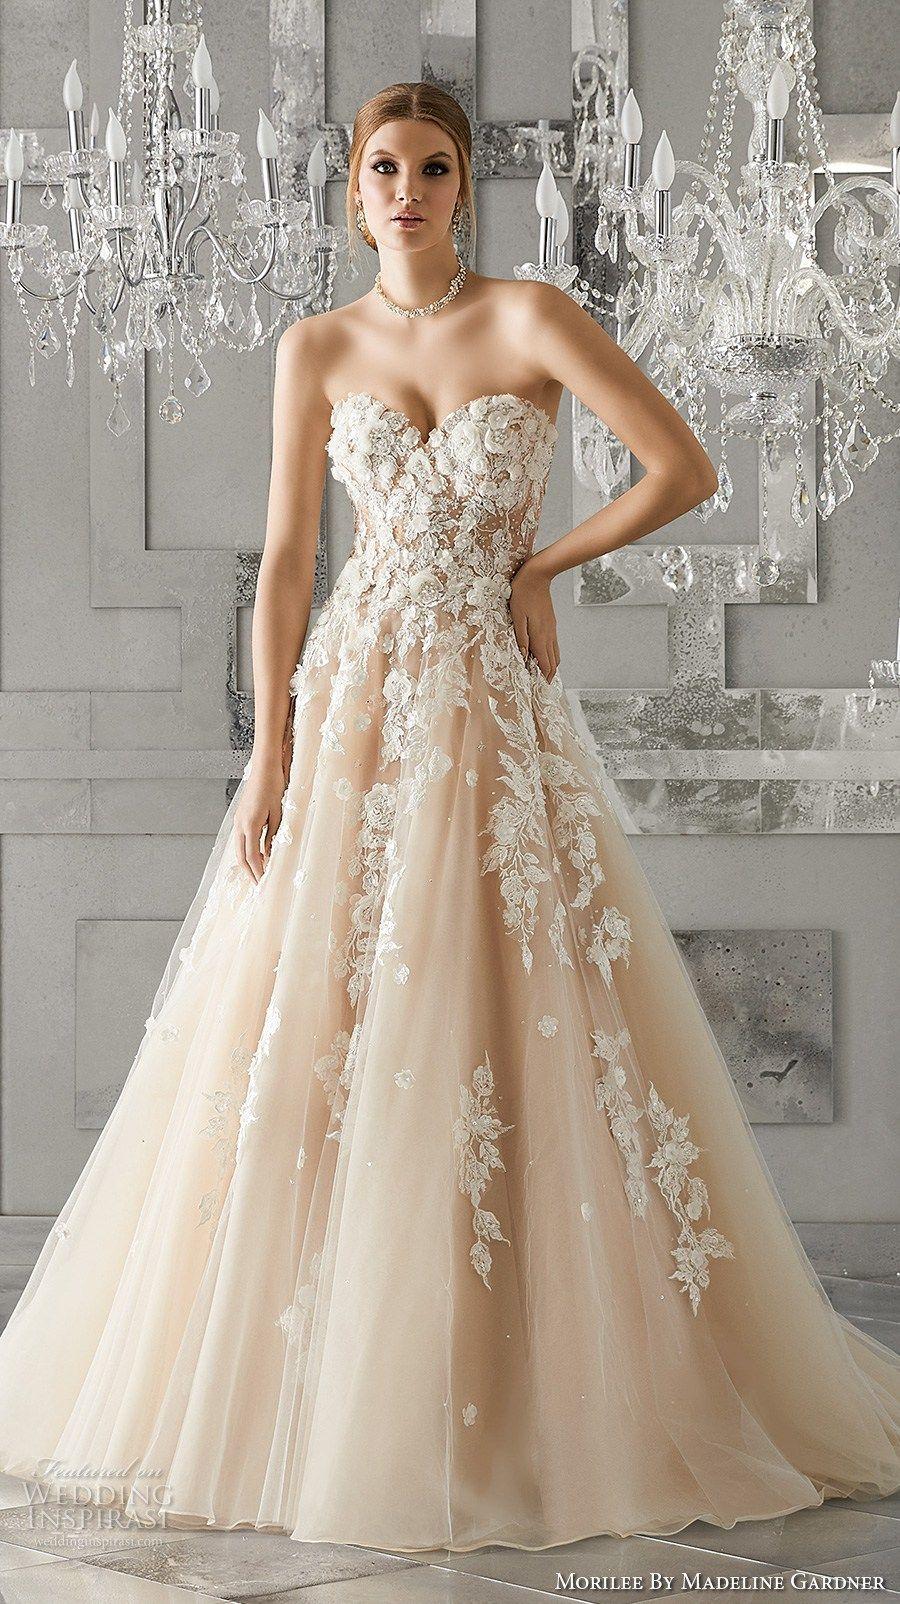 Mori lee madeline gardner wedding dress  Morilee by Madeline Gardner Fall  Wedding Dresses  Bridal